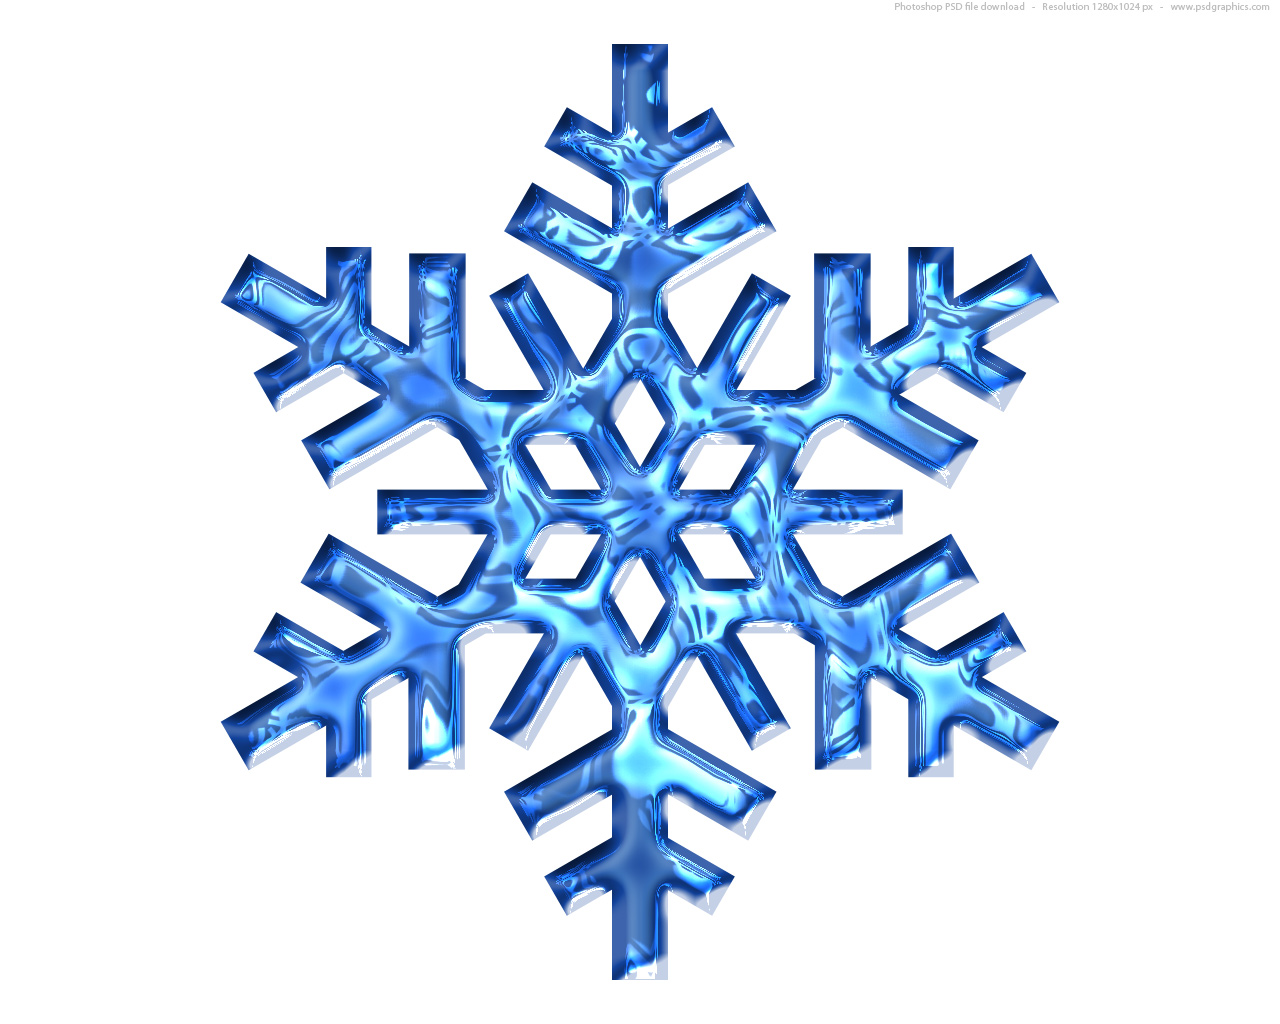 Snowflake transparent background cliparts